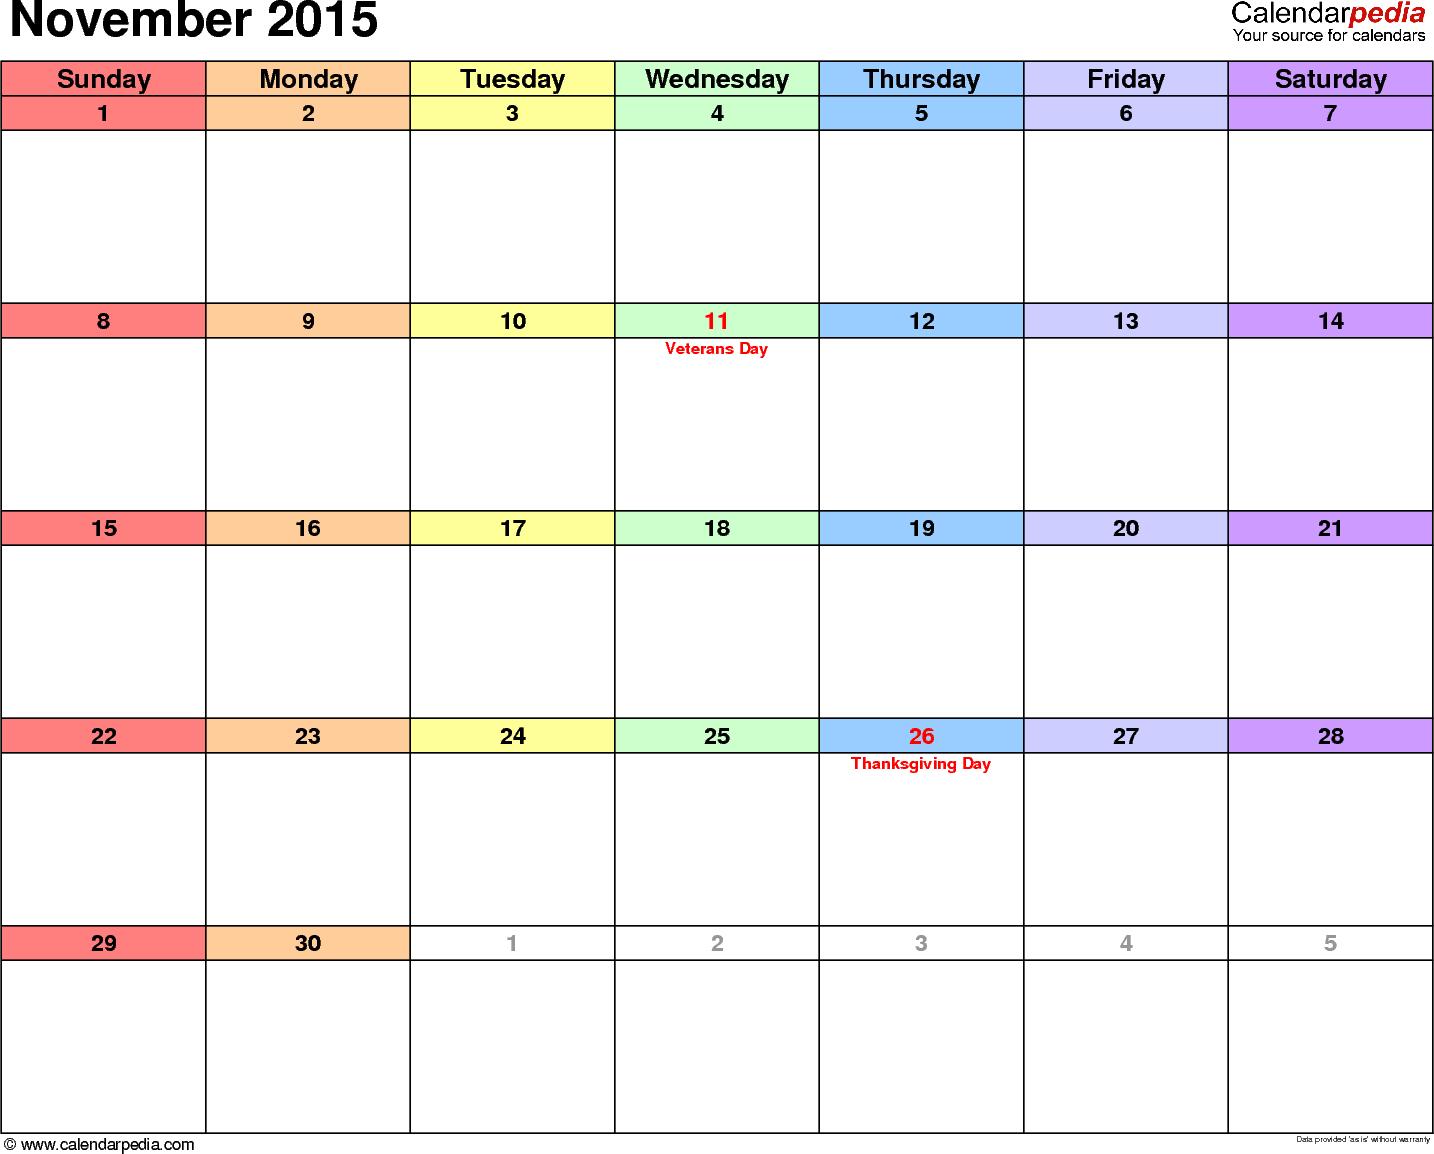 November 2015 calendar printable template